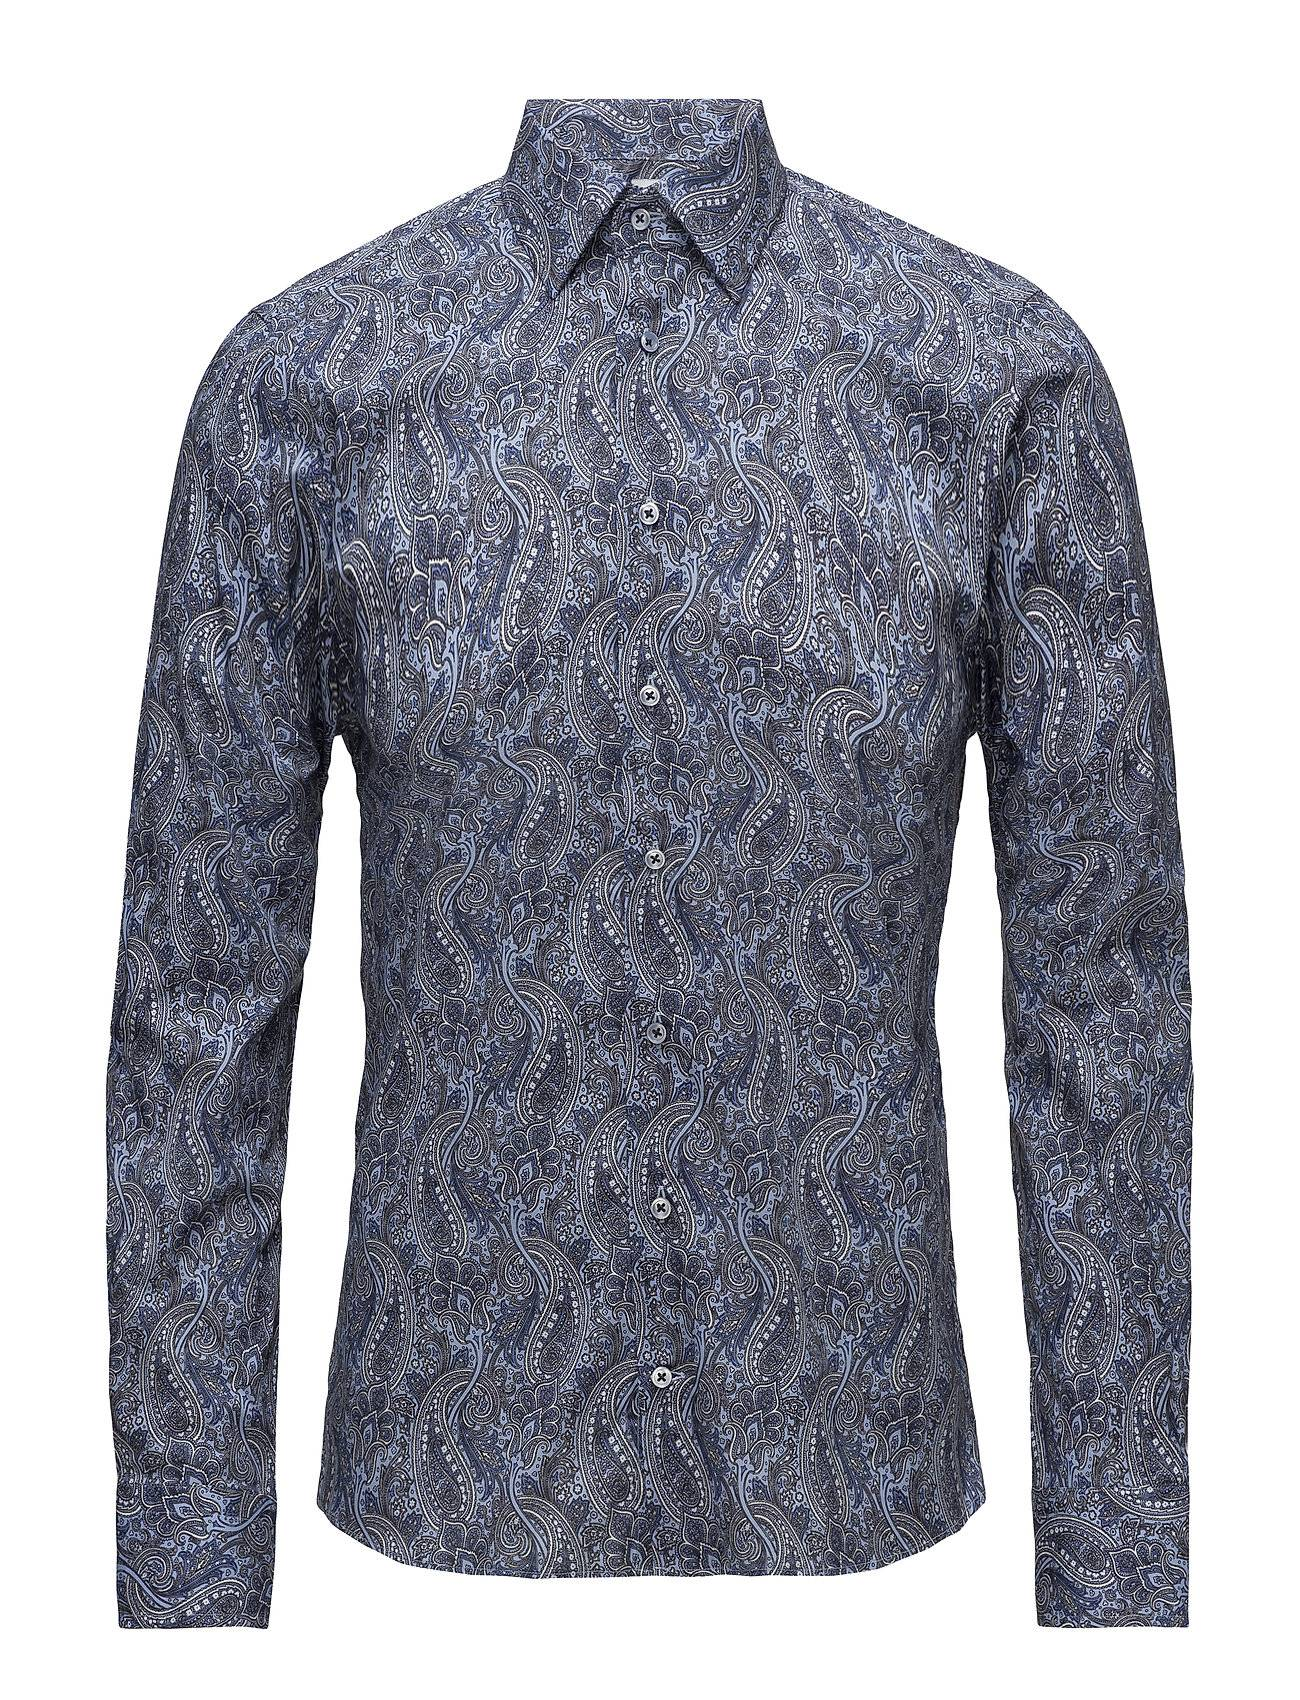 XO Shirtmaker by Sand Copenhagen 8000 - Jake Sc